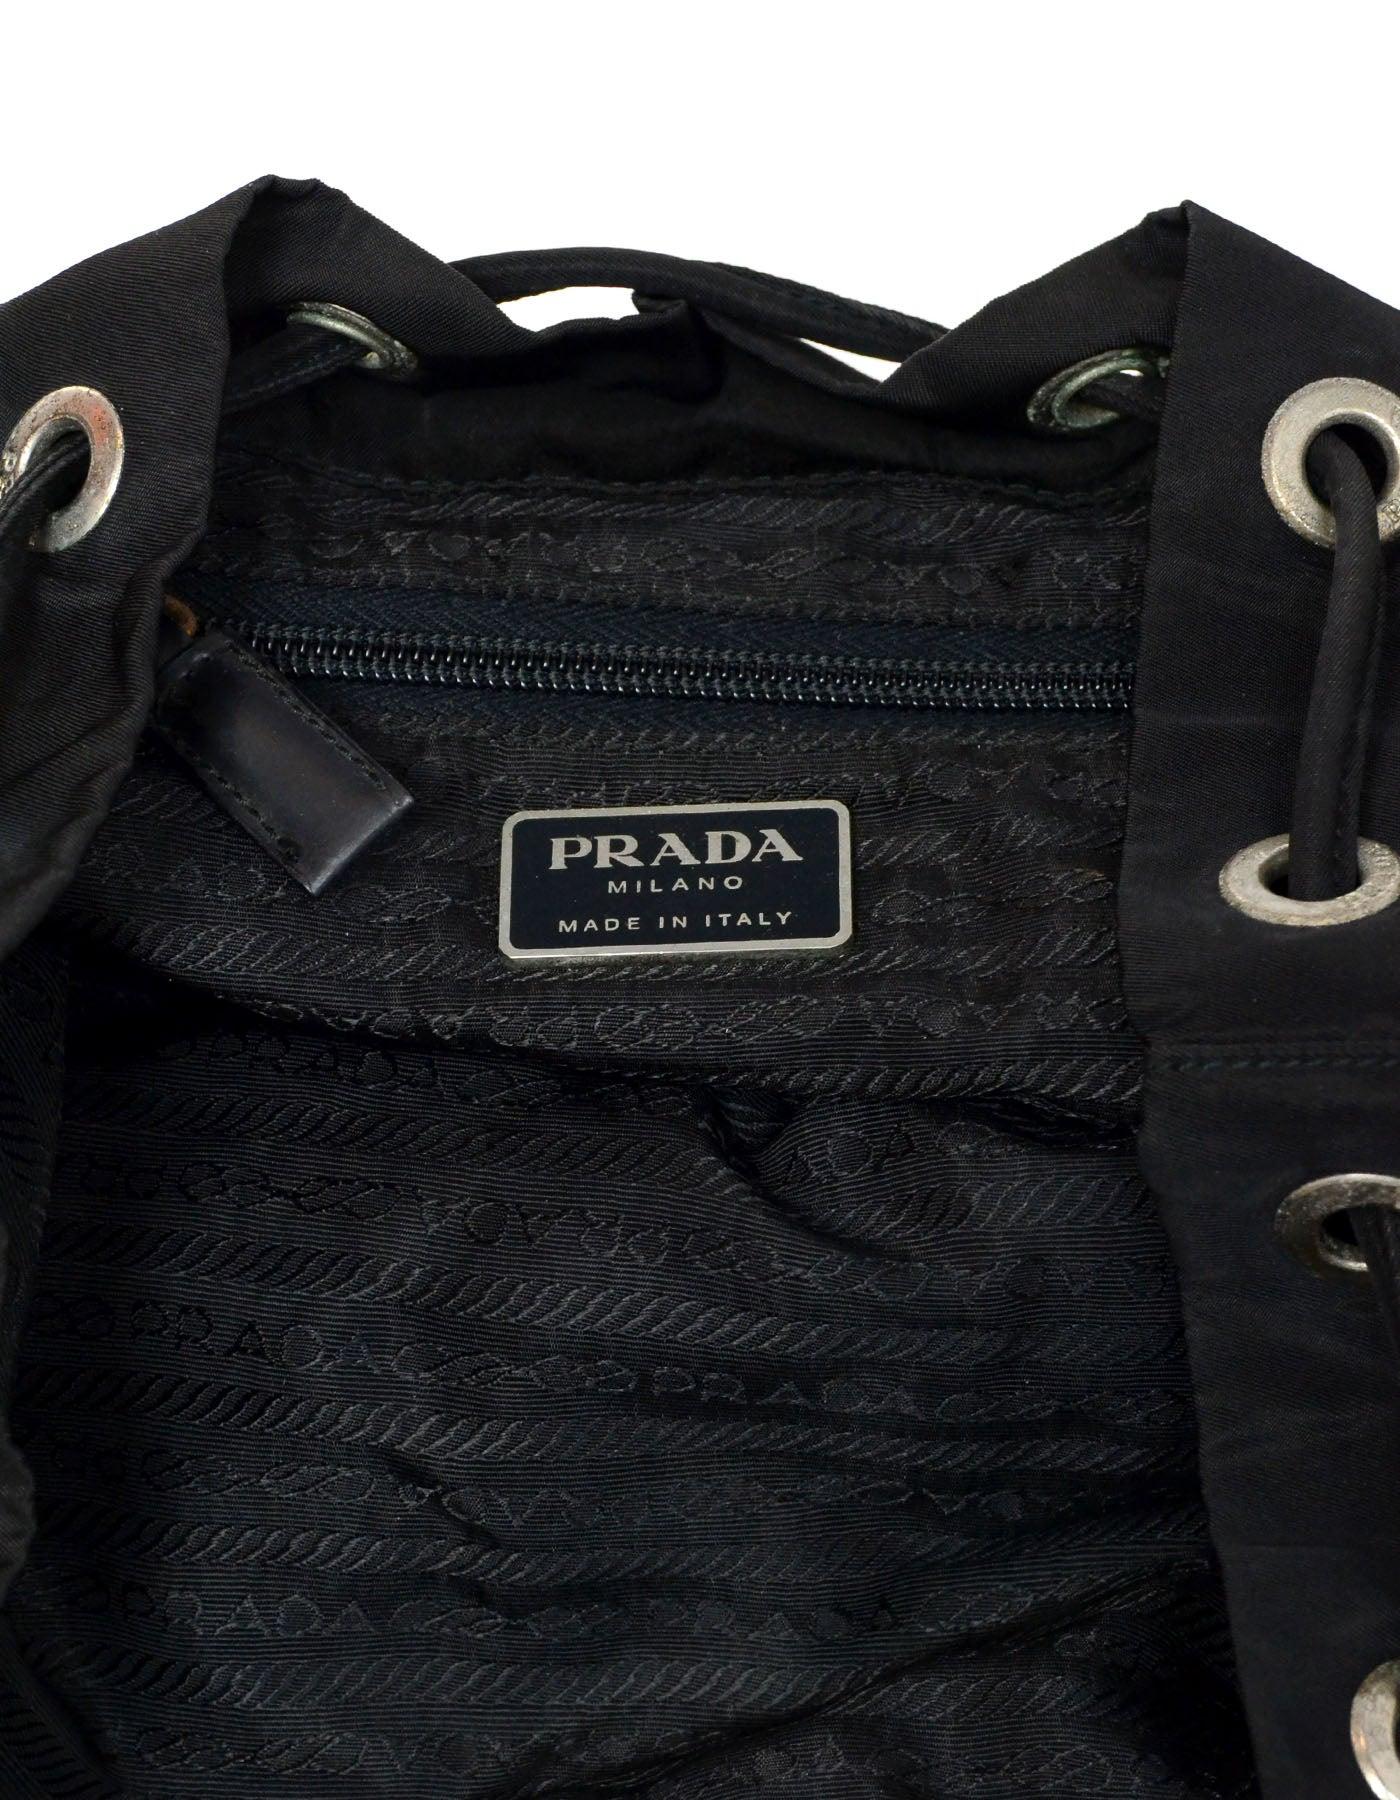 Prada Vintage Black Drawstring Nylon Backpack Bag w  Front Zipper Pocket  For Sale at 1stdibs ae5a56b7815f9